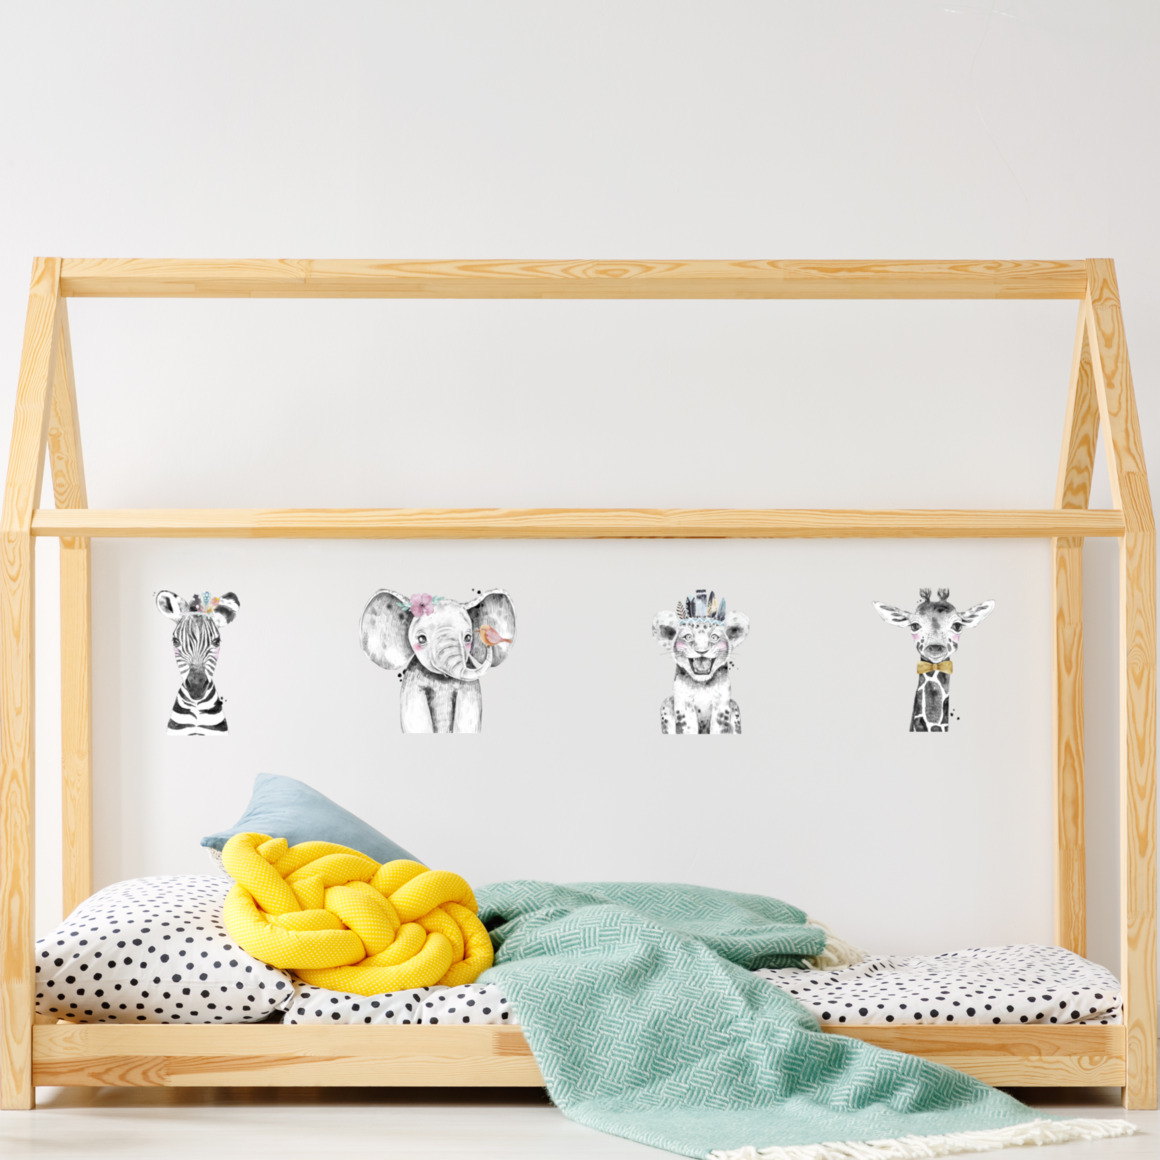 Fabric wall decals - Safari babies   Trada Marketplace